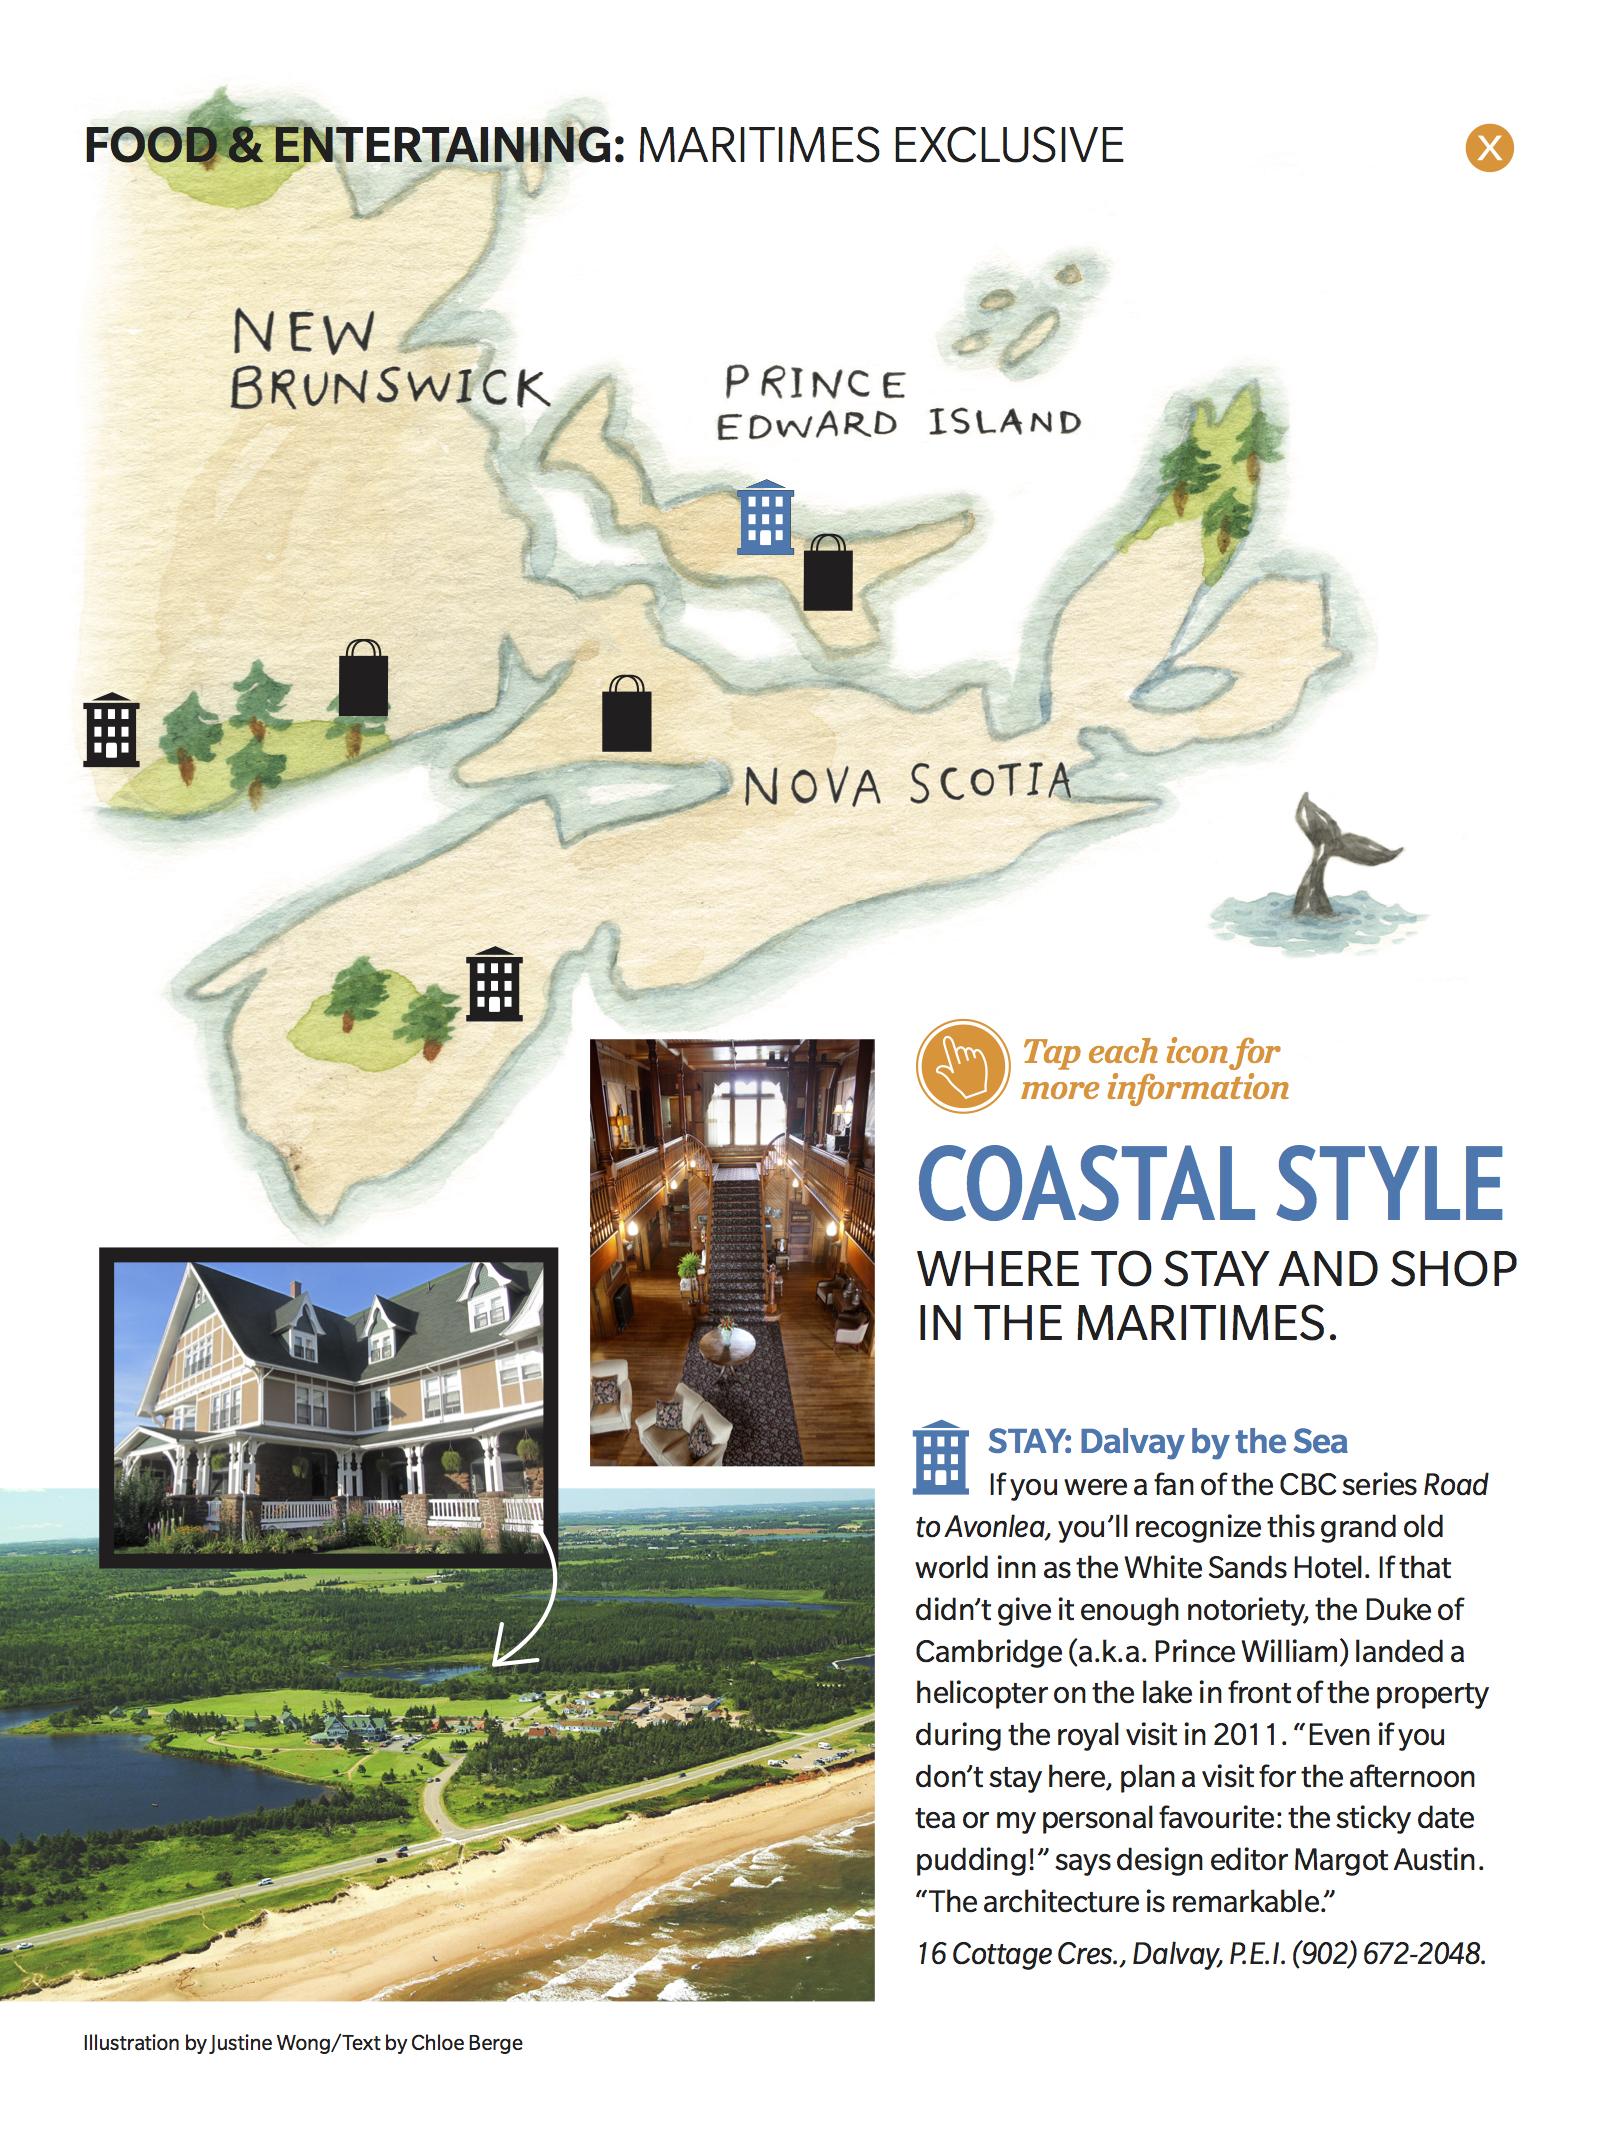 East Coast Travel Guide_House & Home Magazine iPad Edition_July 20143.jpg